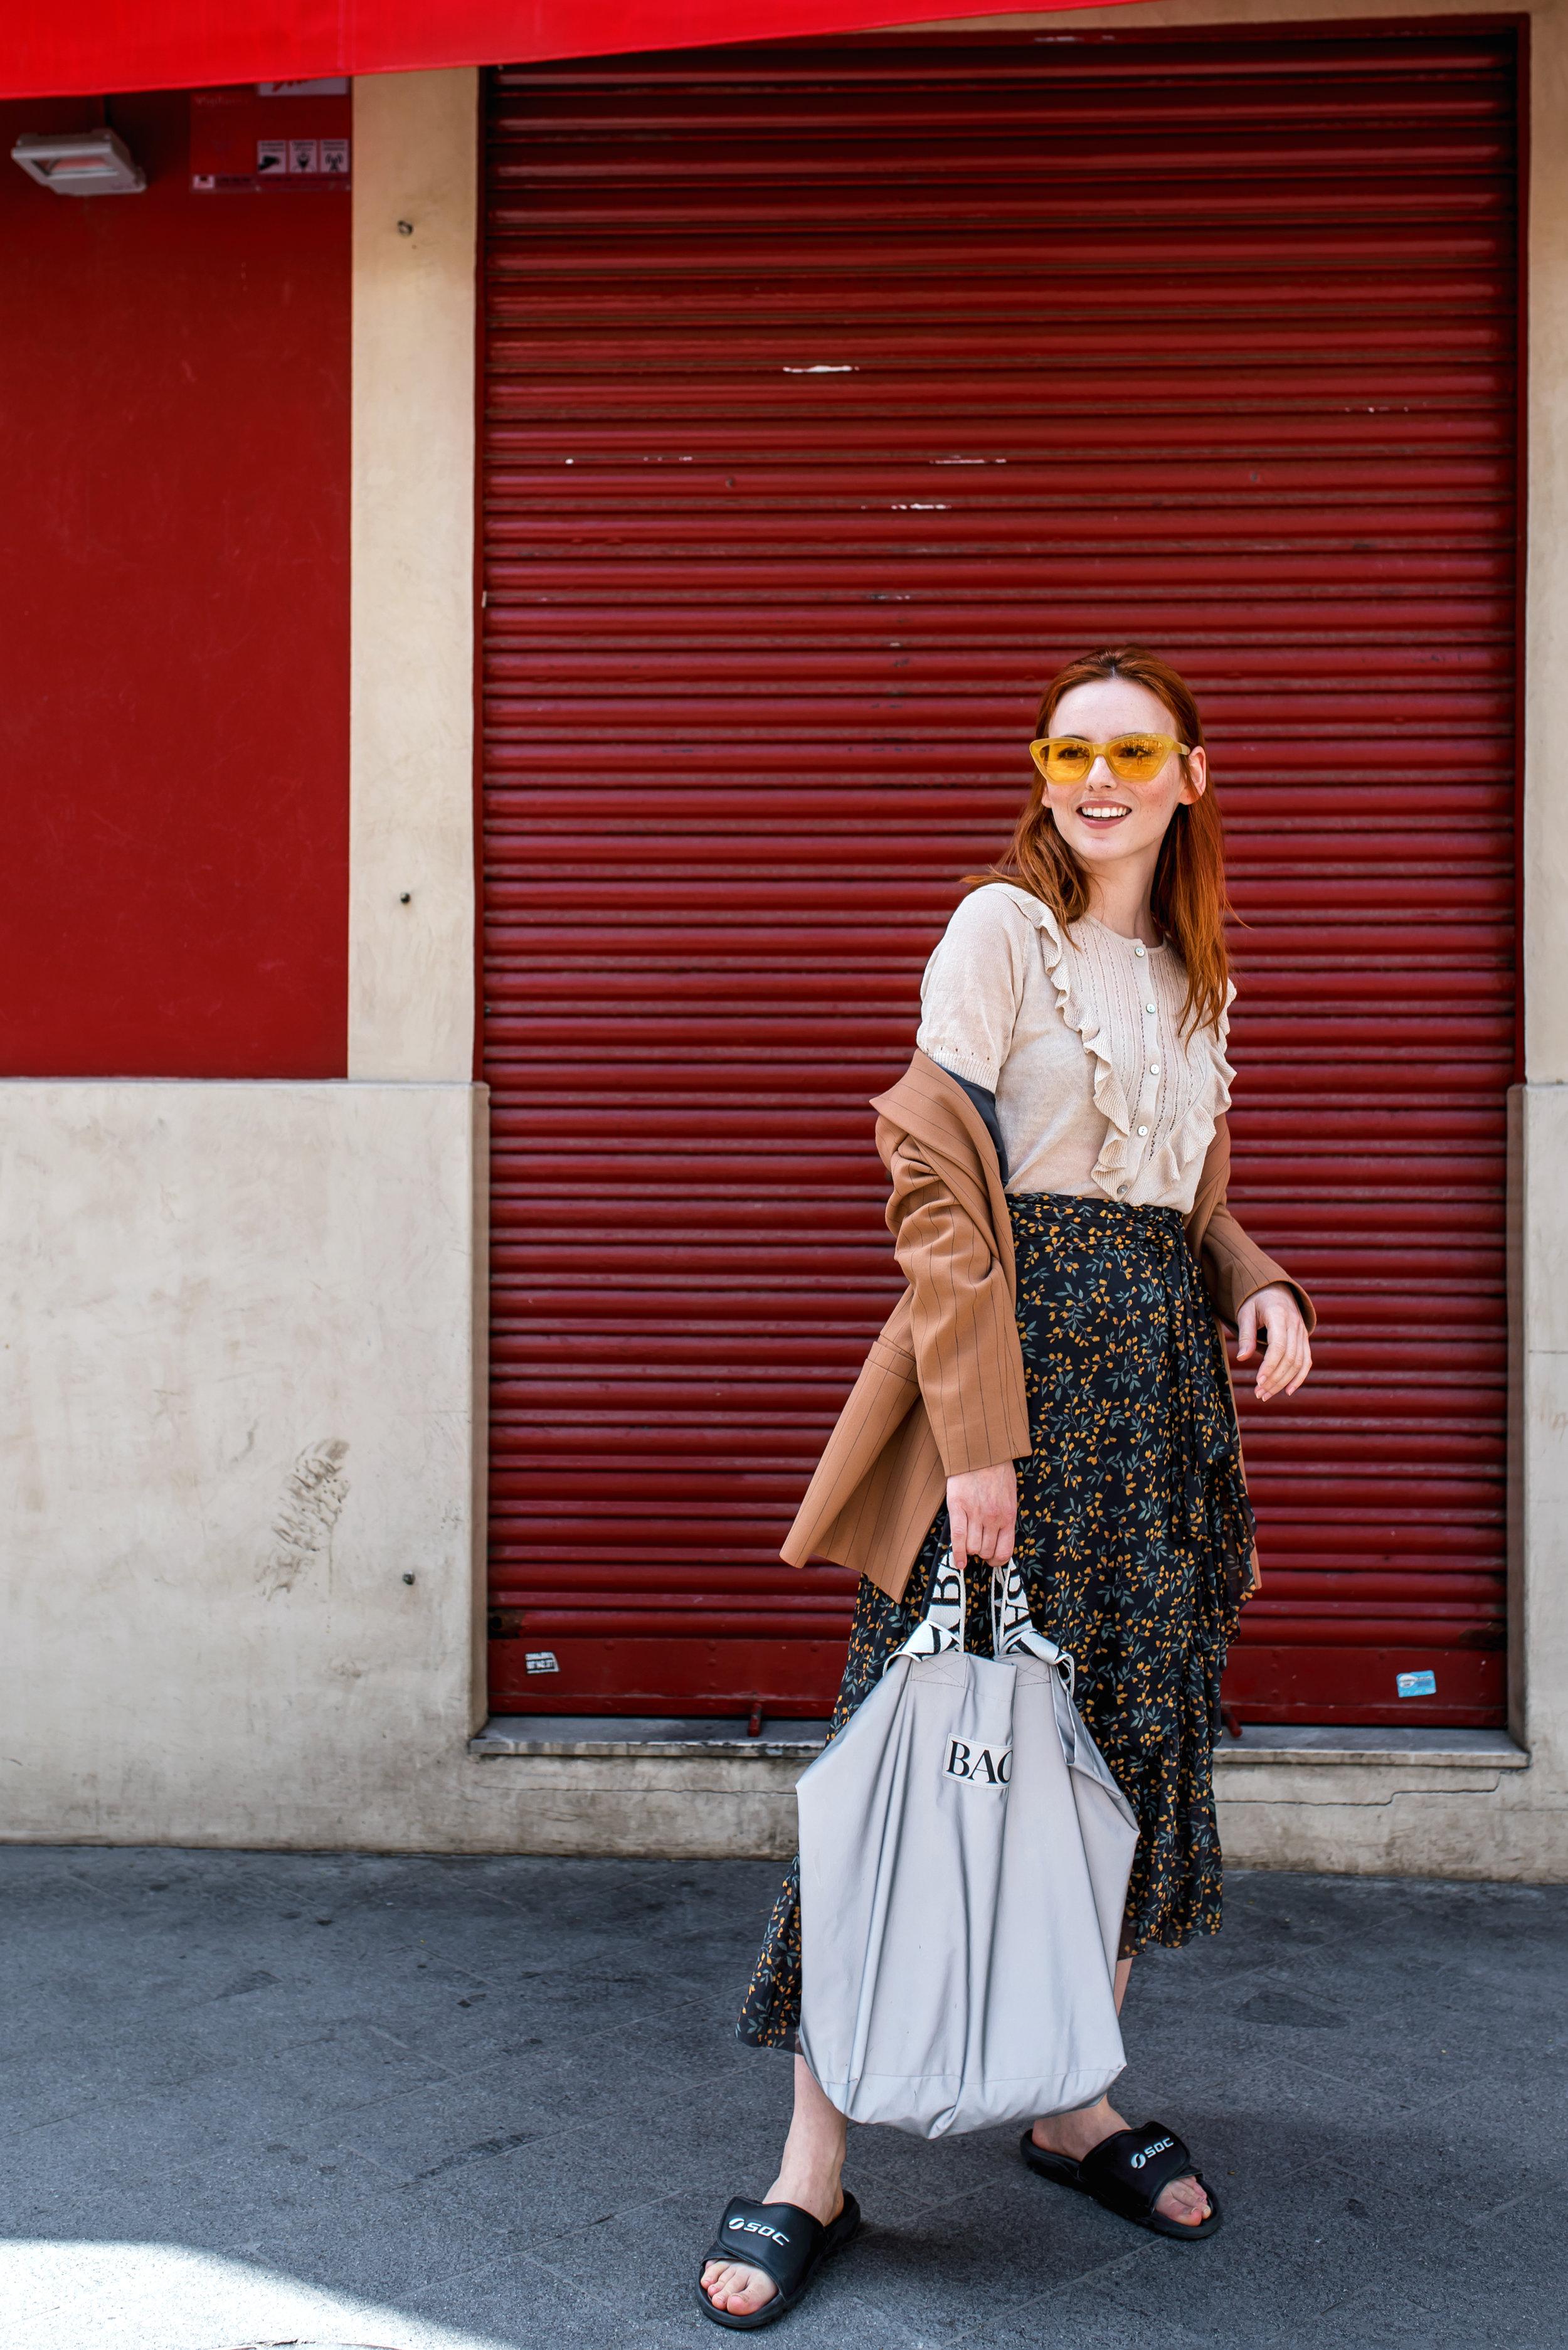 Noa Noa top // Ganni skirt // BACK bag // Mango sunnies